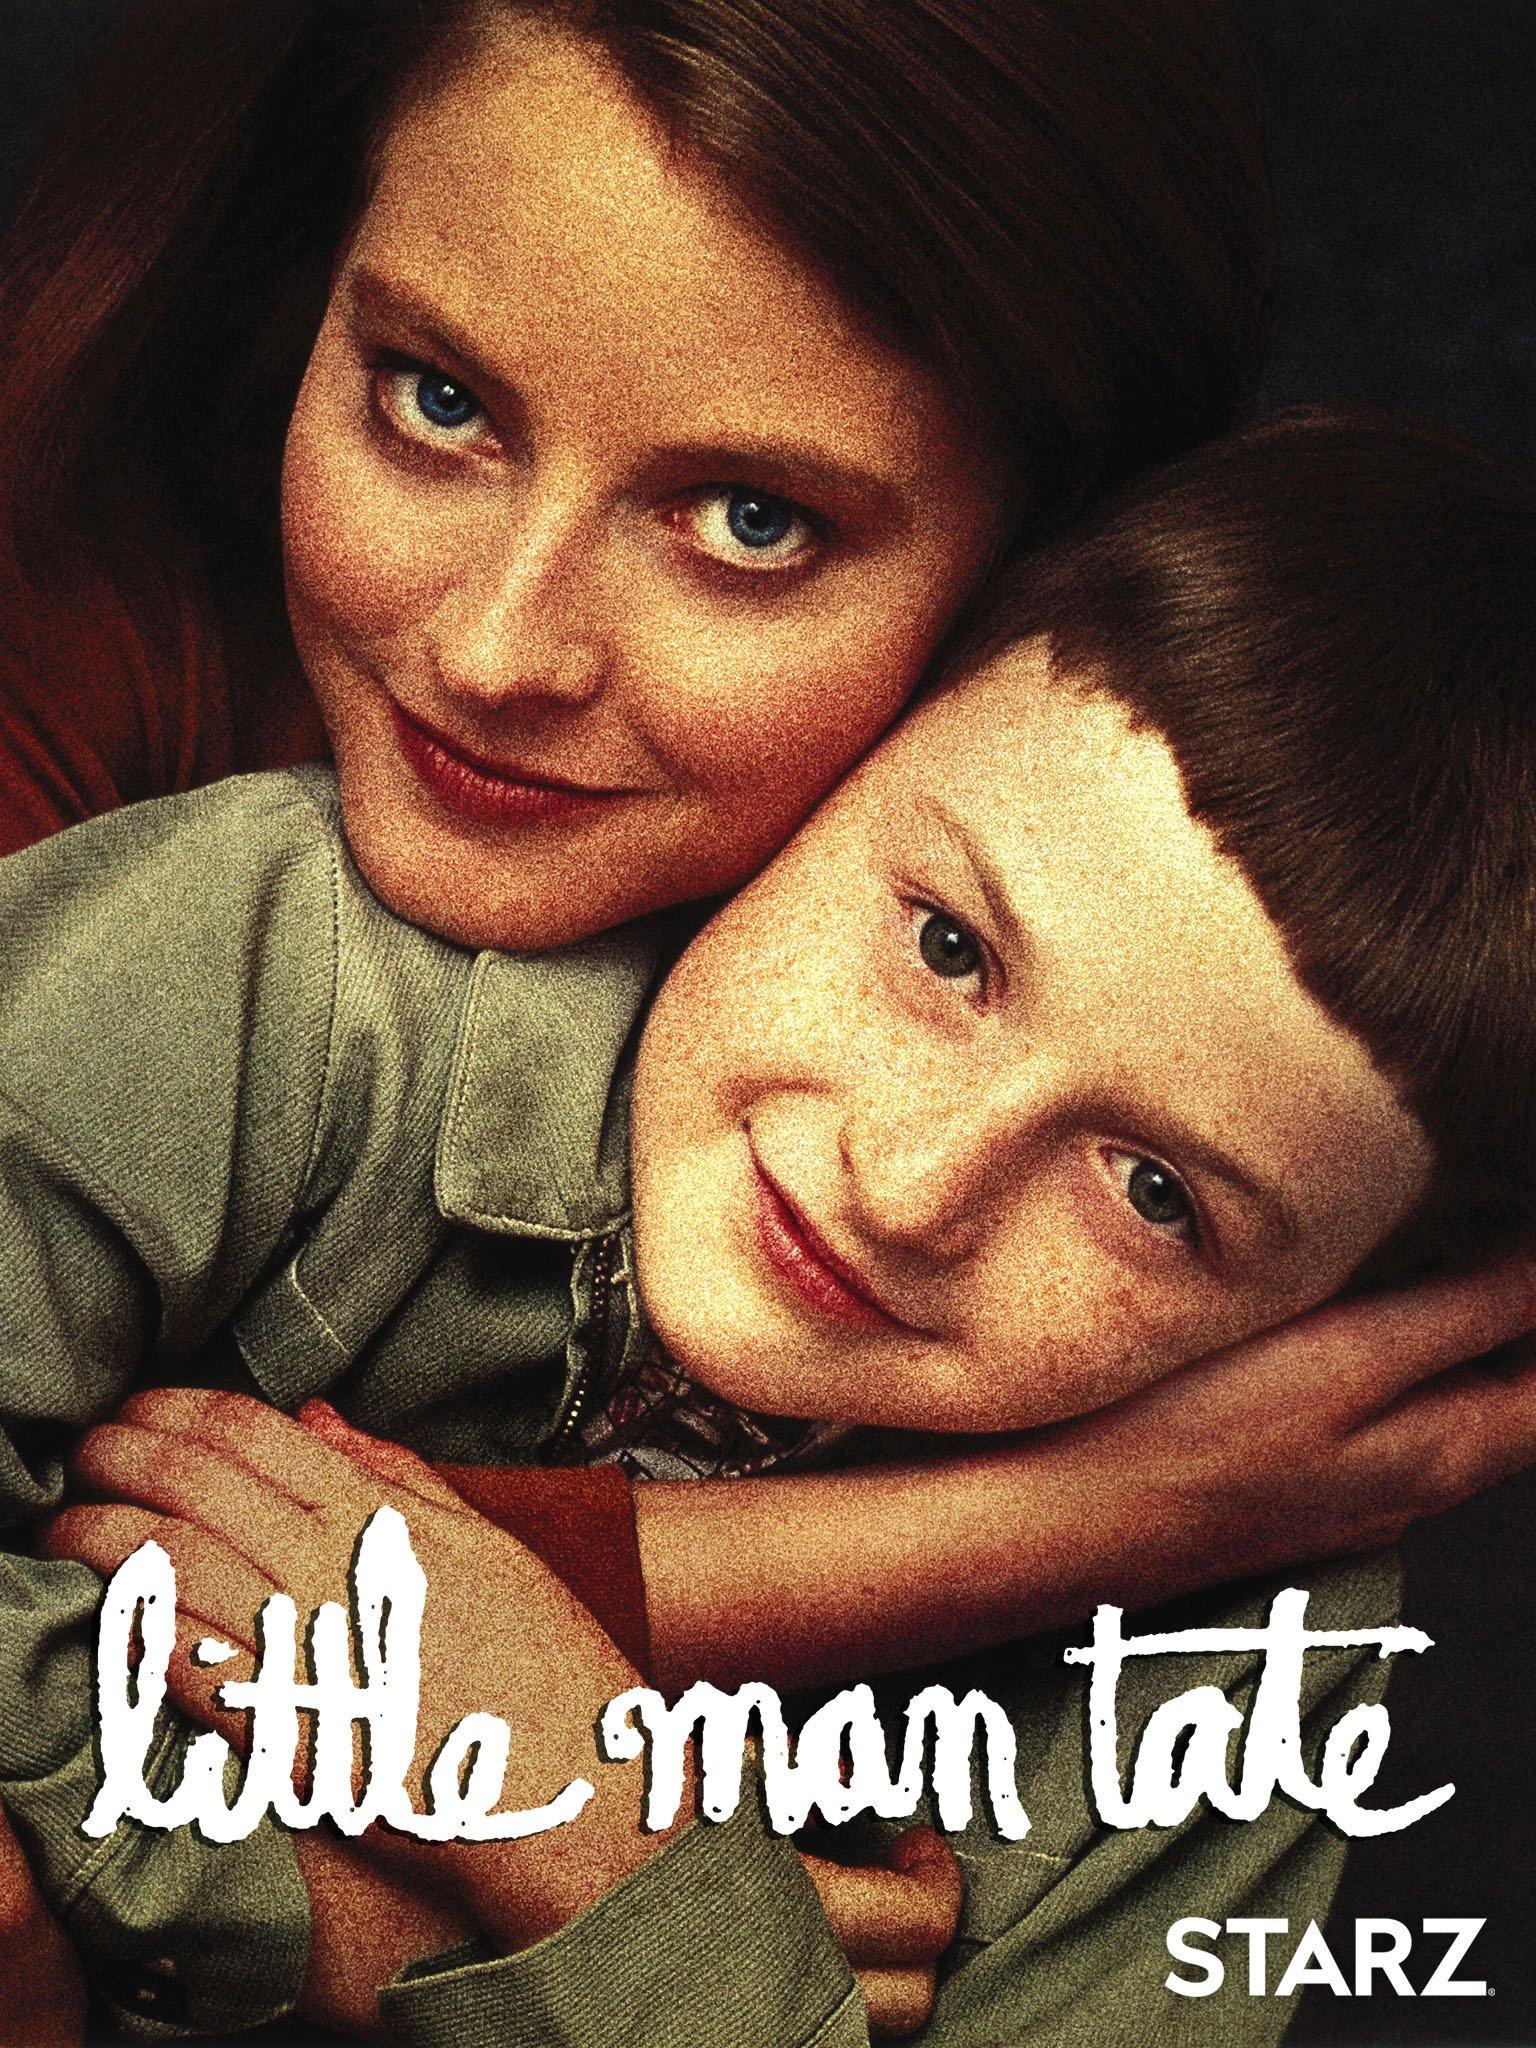 little man tate full movie free online